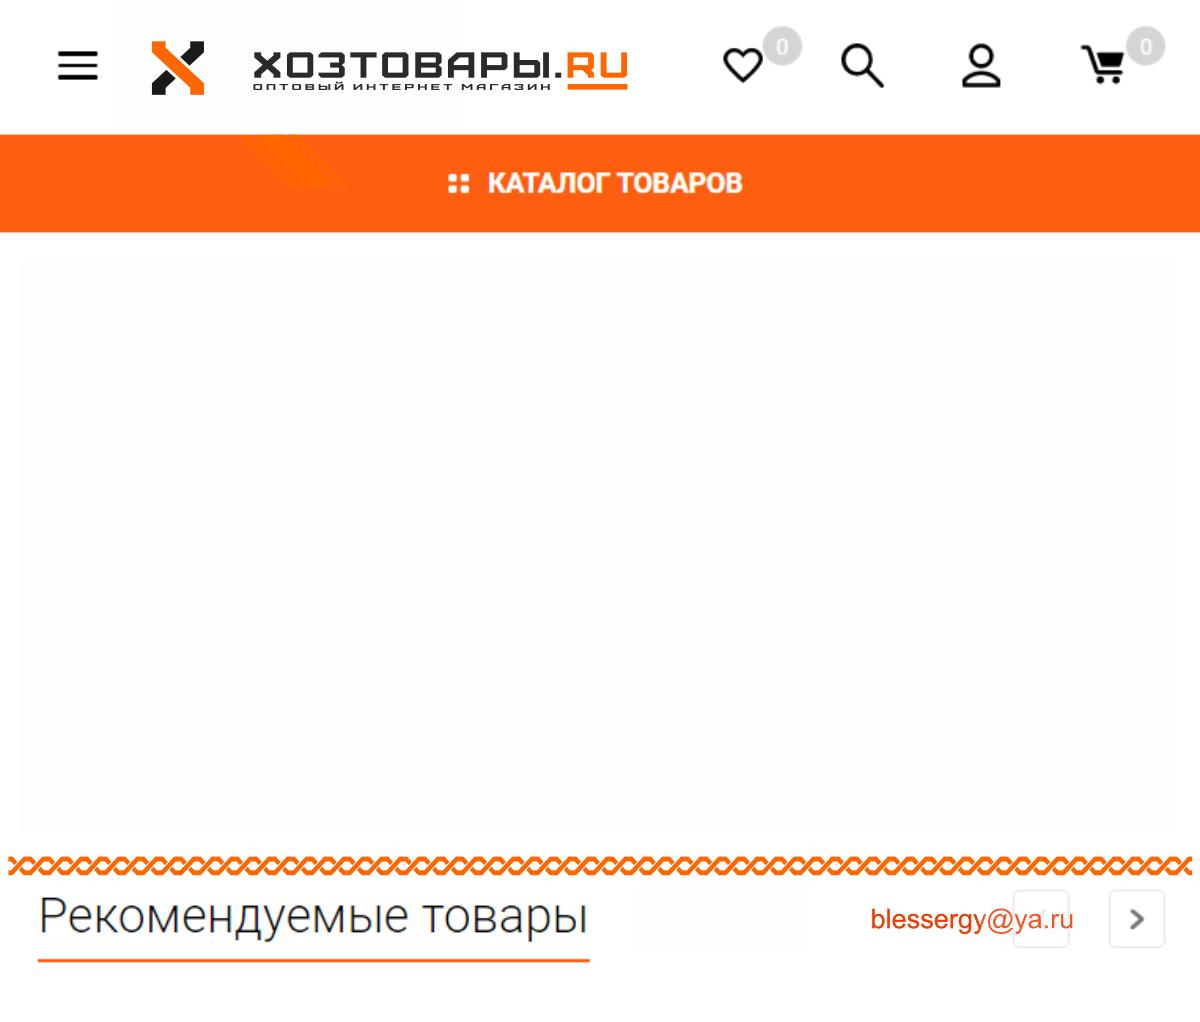 Разработка логотипа для оптового интернет-магазина «Хозтовары.ру» фото f_5476073949e59a34.png